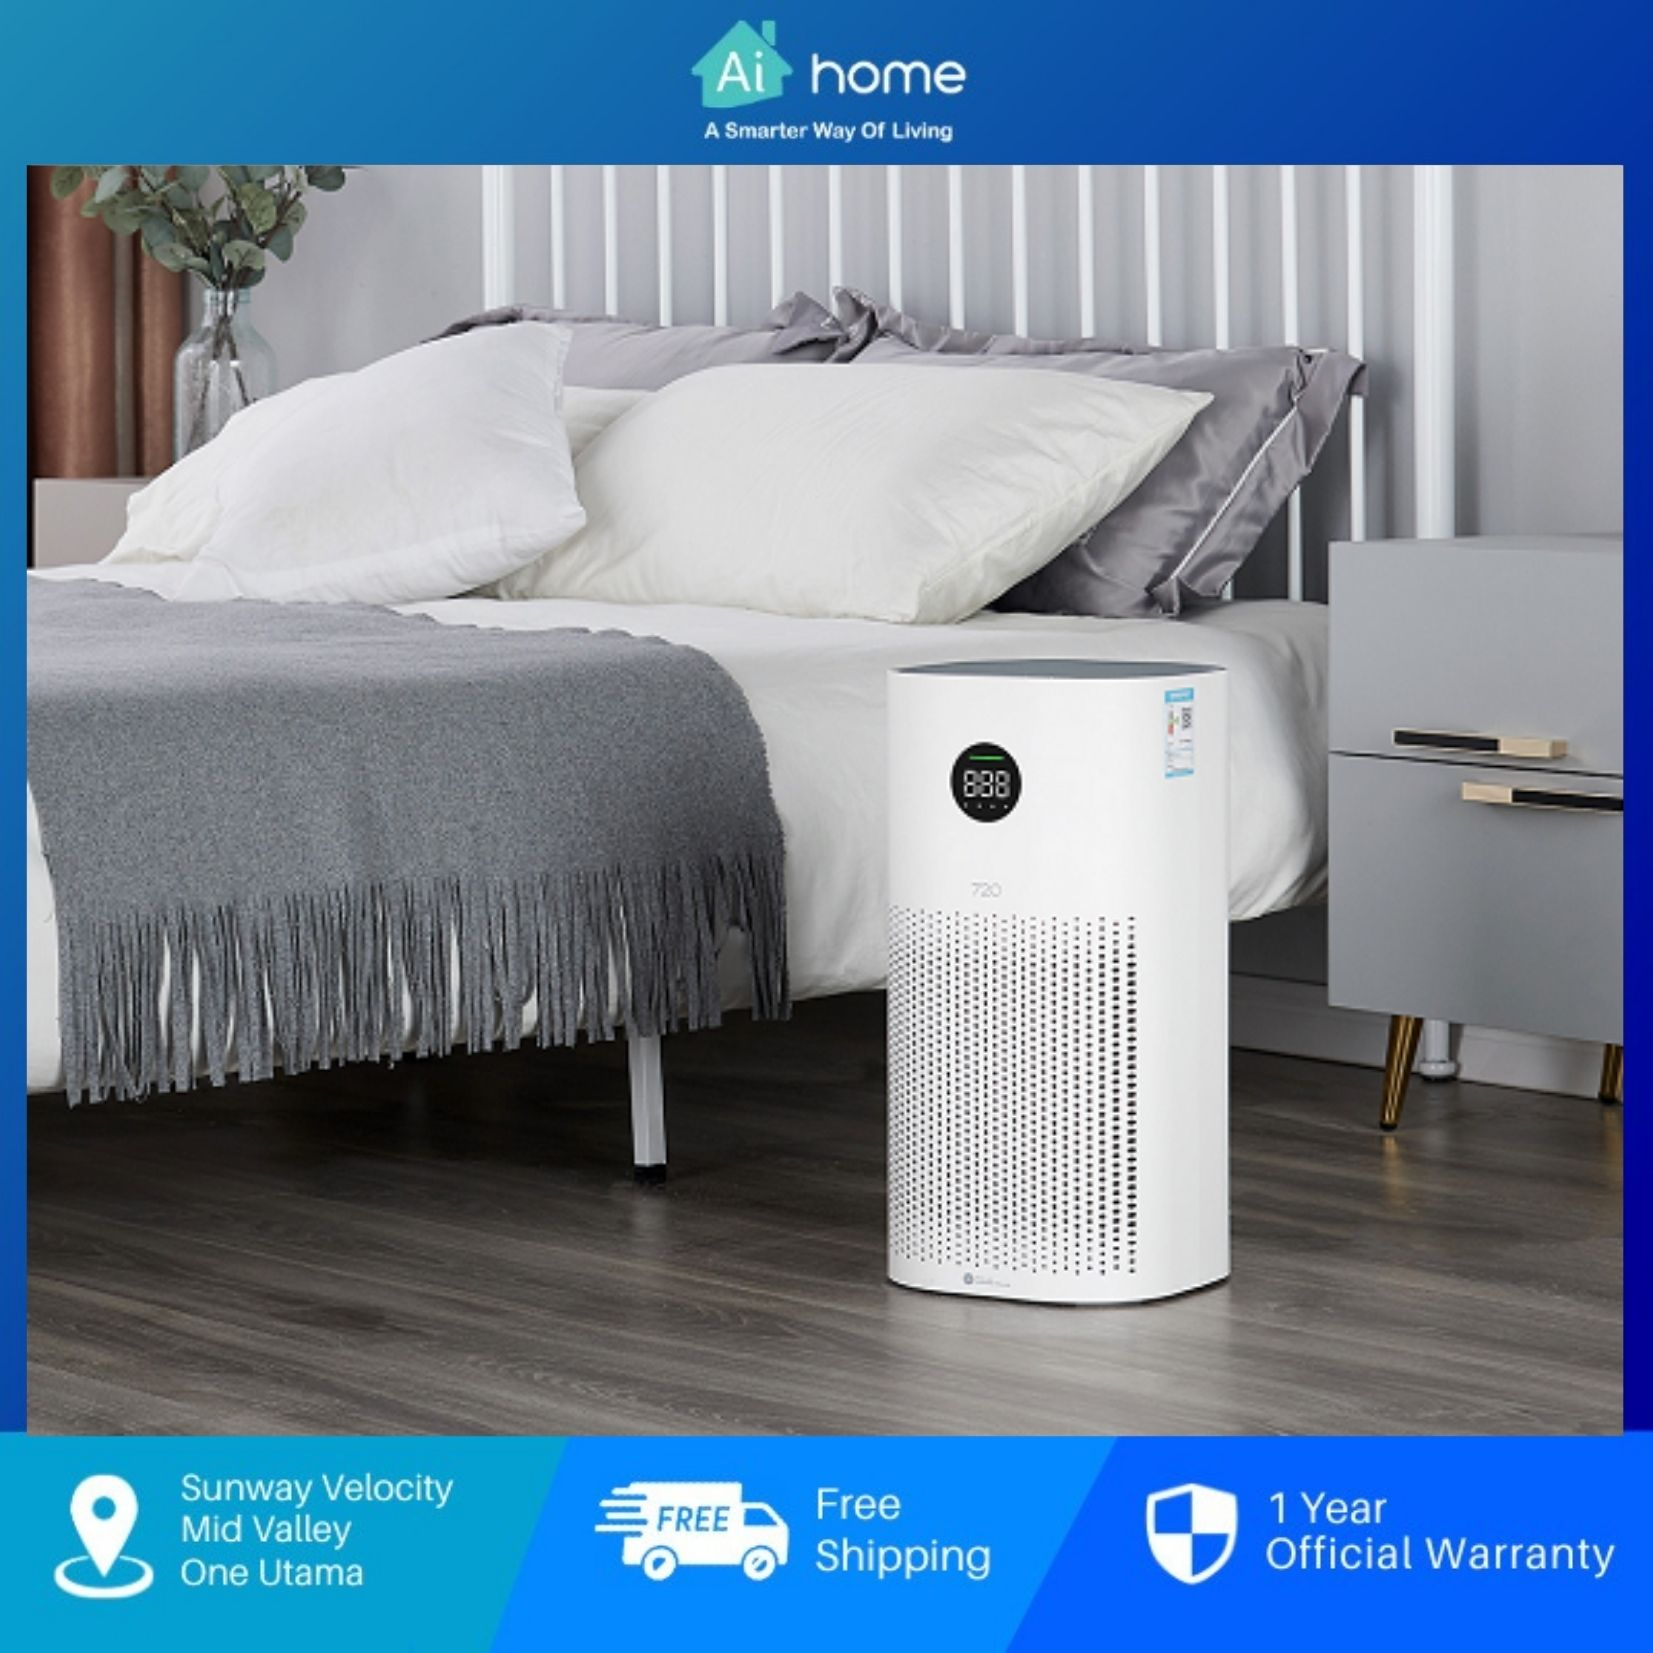 HUAWEI Hilink 720 Smart Air Purifier 1i - CN Version   Household De-formaldehyde Desphesion   Haze Particles  [ Aihome ]